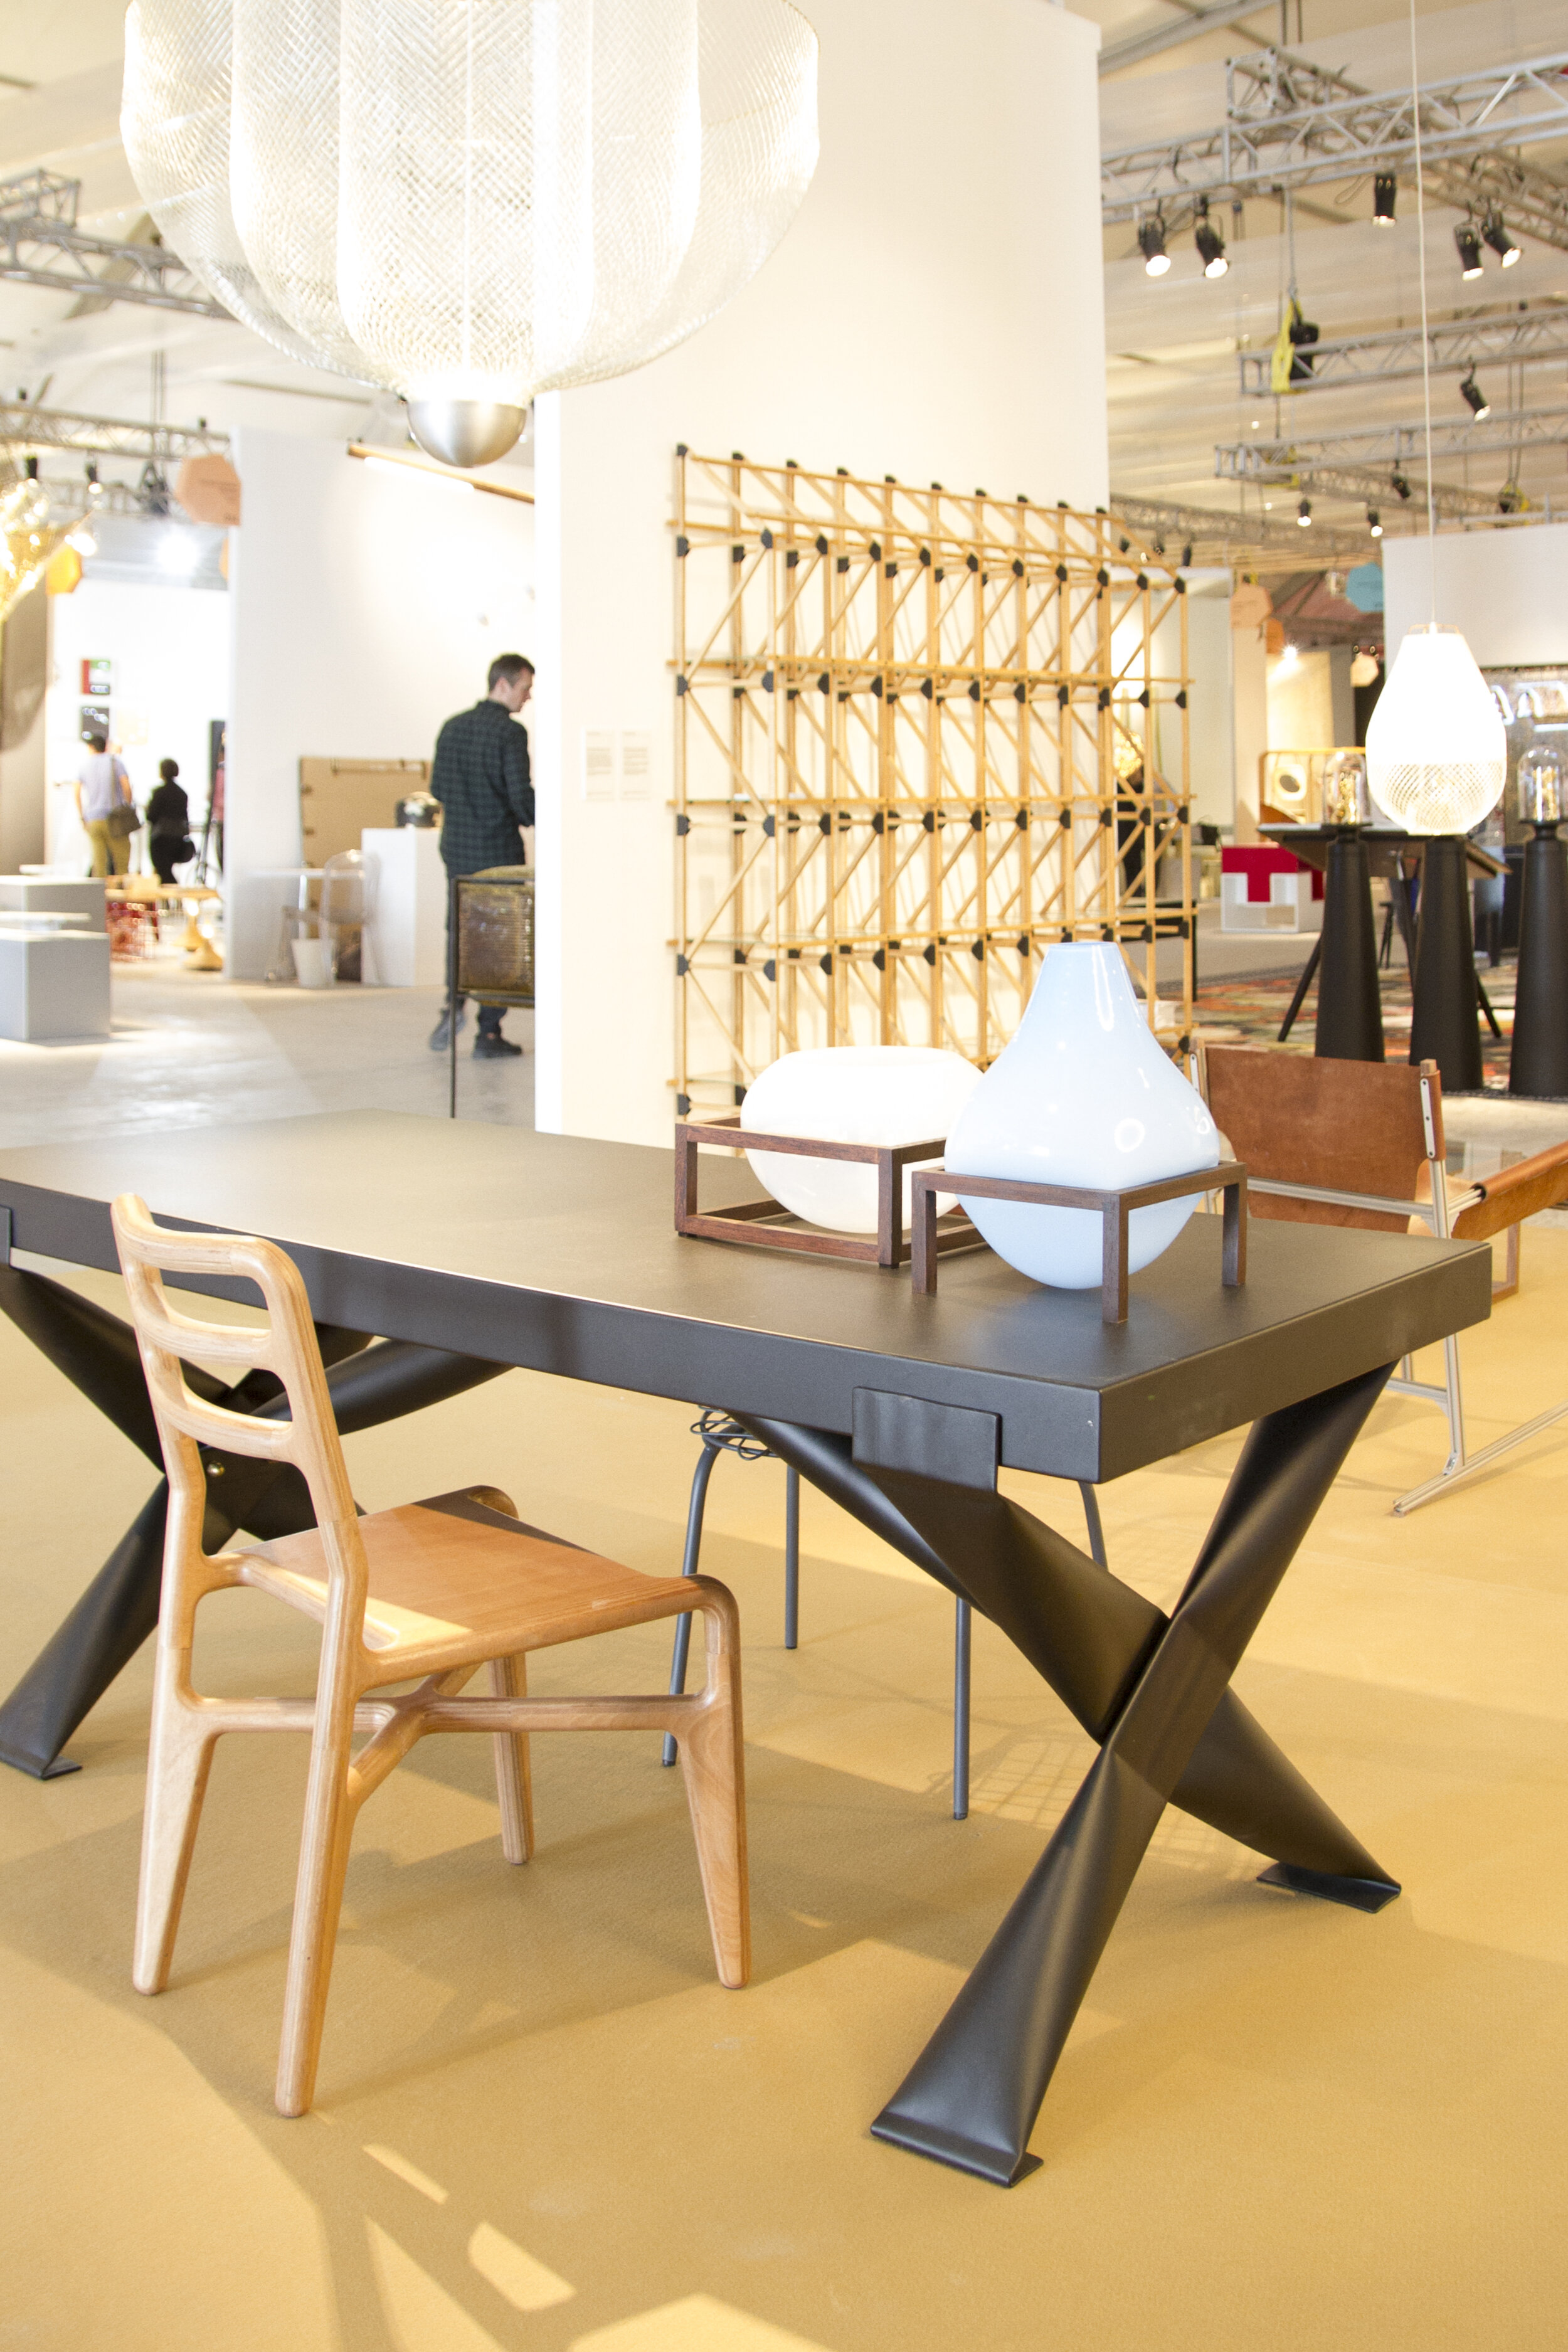 Table vases by Thier en van Daalen